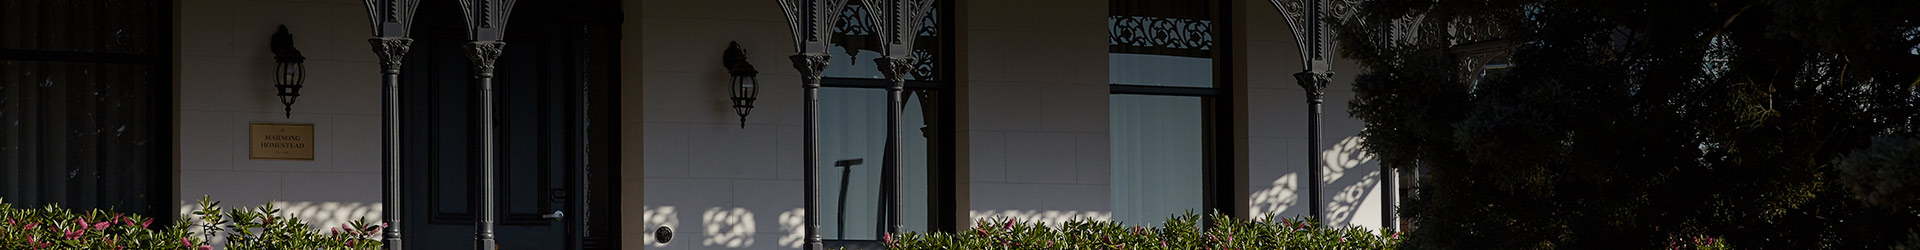 marnong estate accommodation page header dark